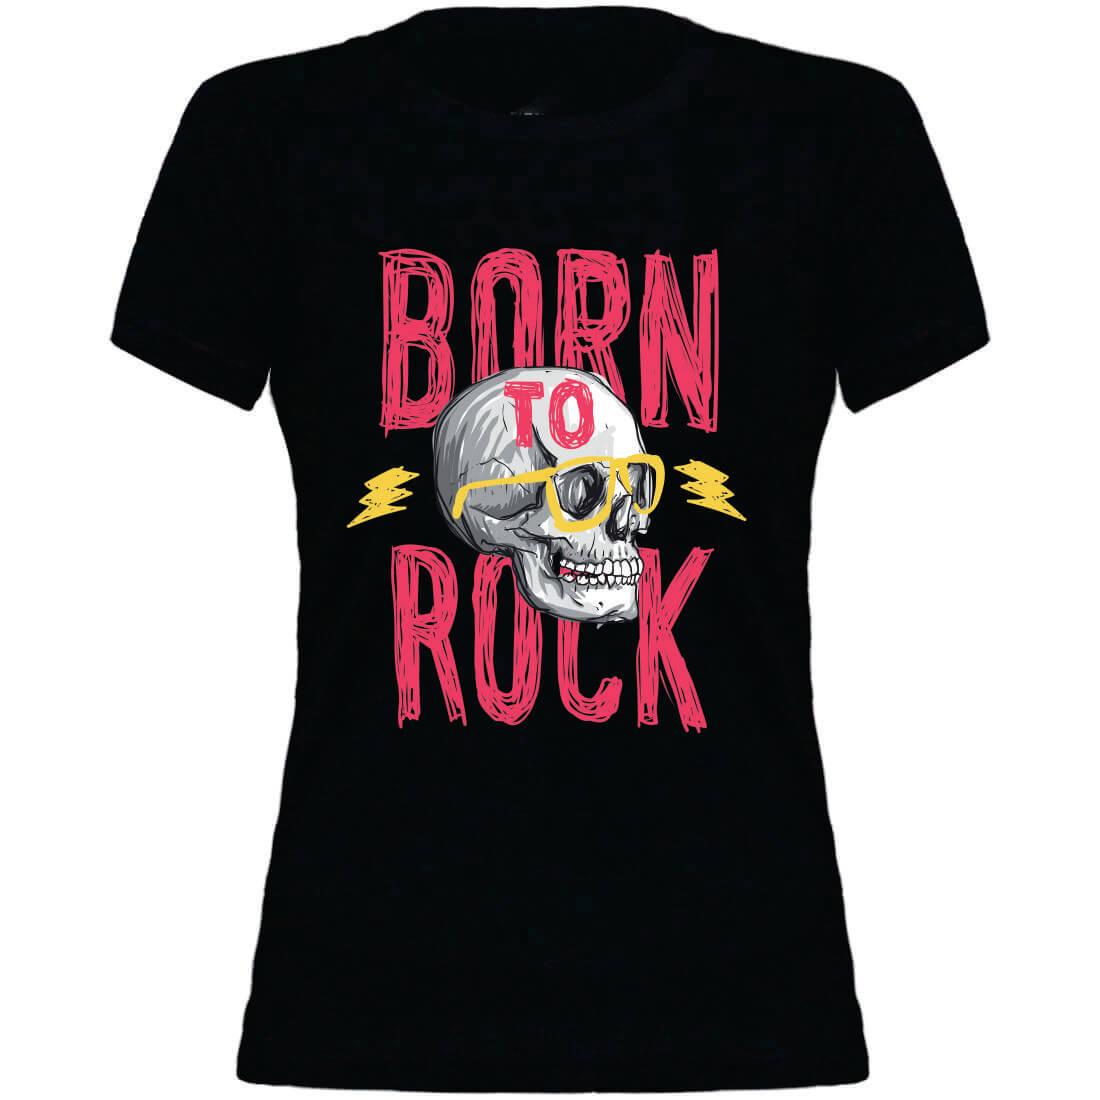 T-shirt Feminina Juvenil Born To Rock